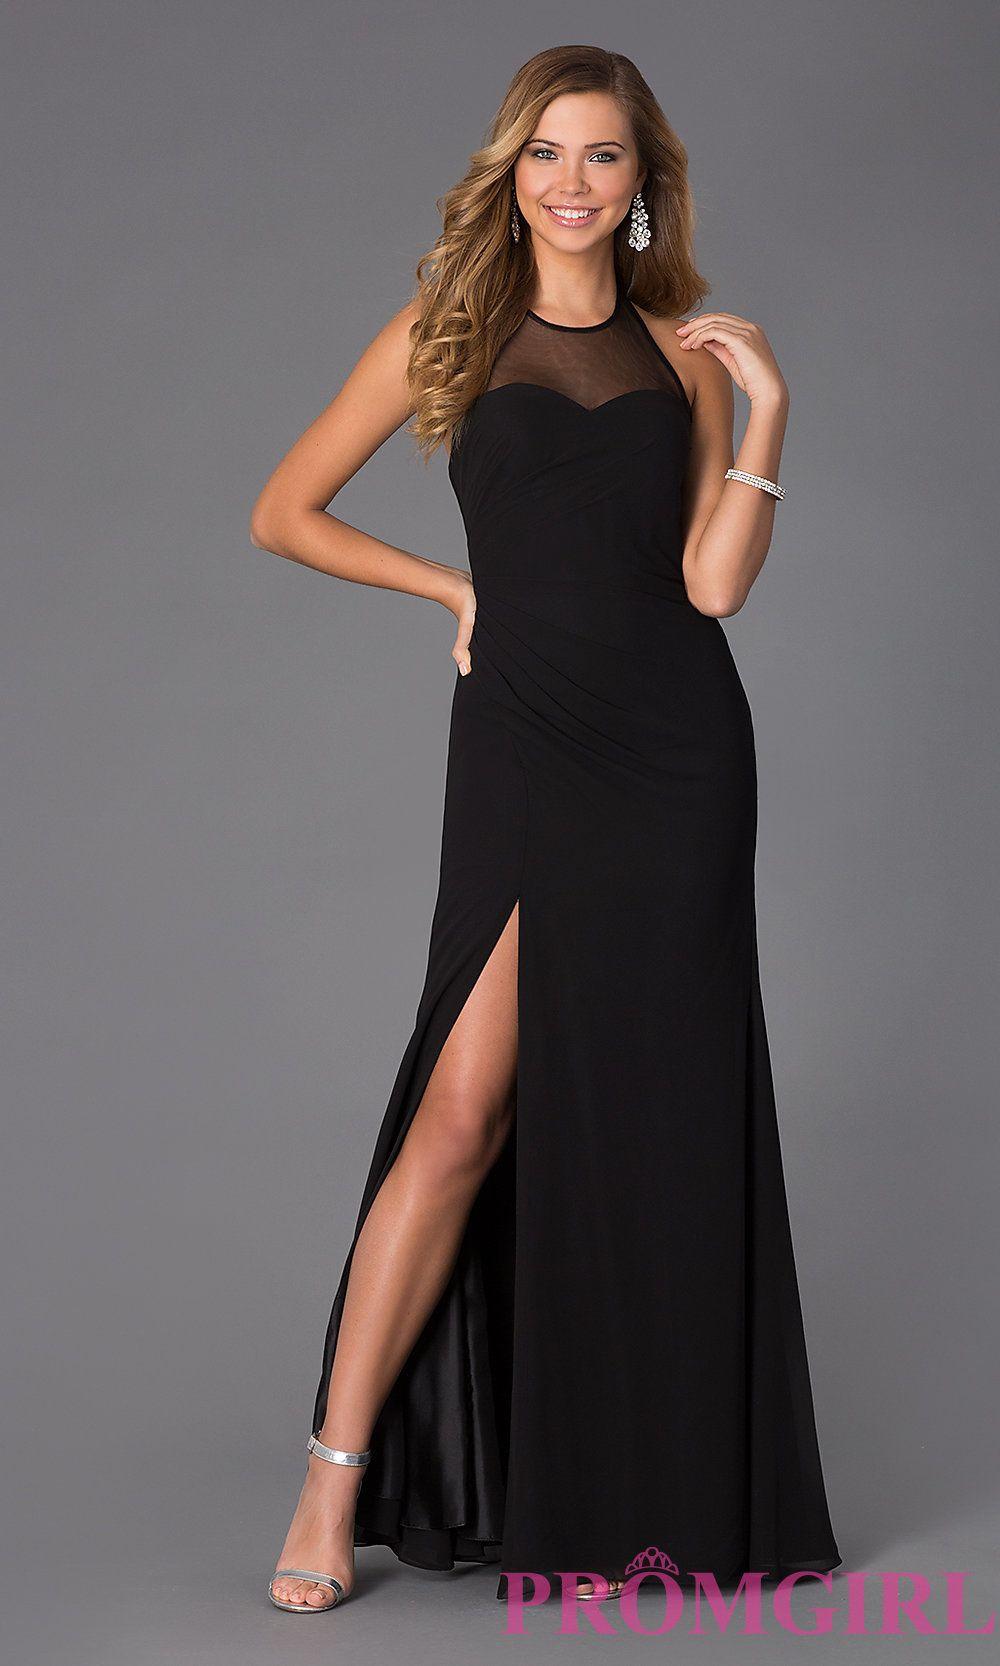 Prom Dresses, Plus-Size Dresses, Prom Shoes - PromGirl